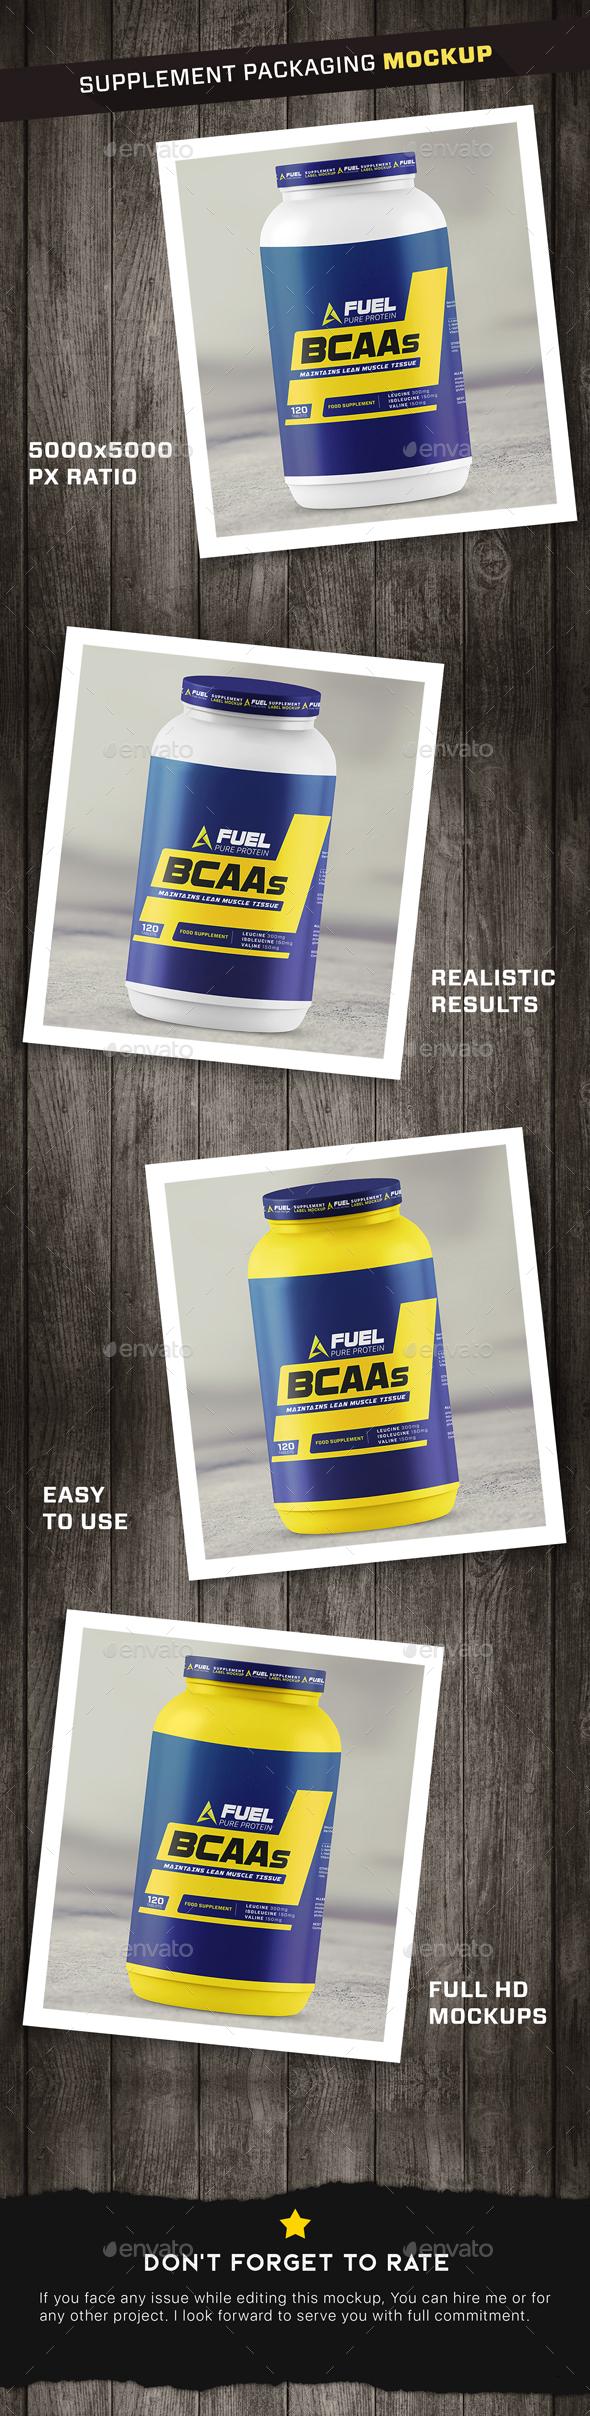 GraphicRiver Protein Powder Supplement Bottle Mockup 21173695